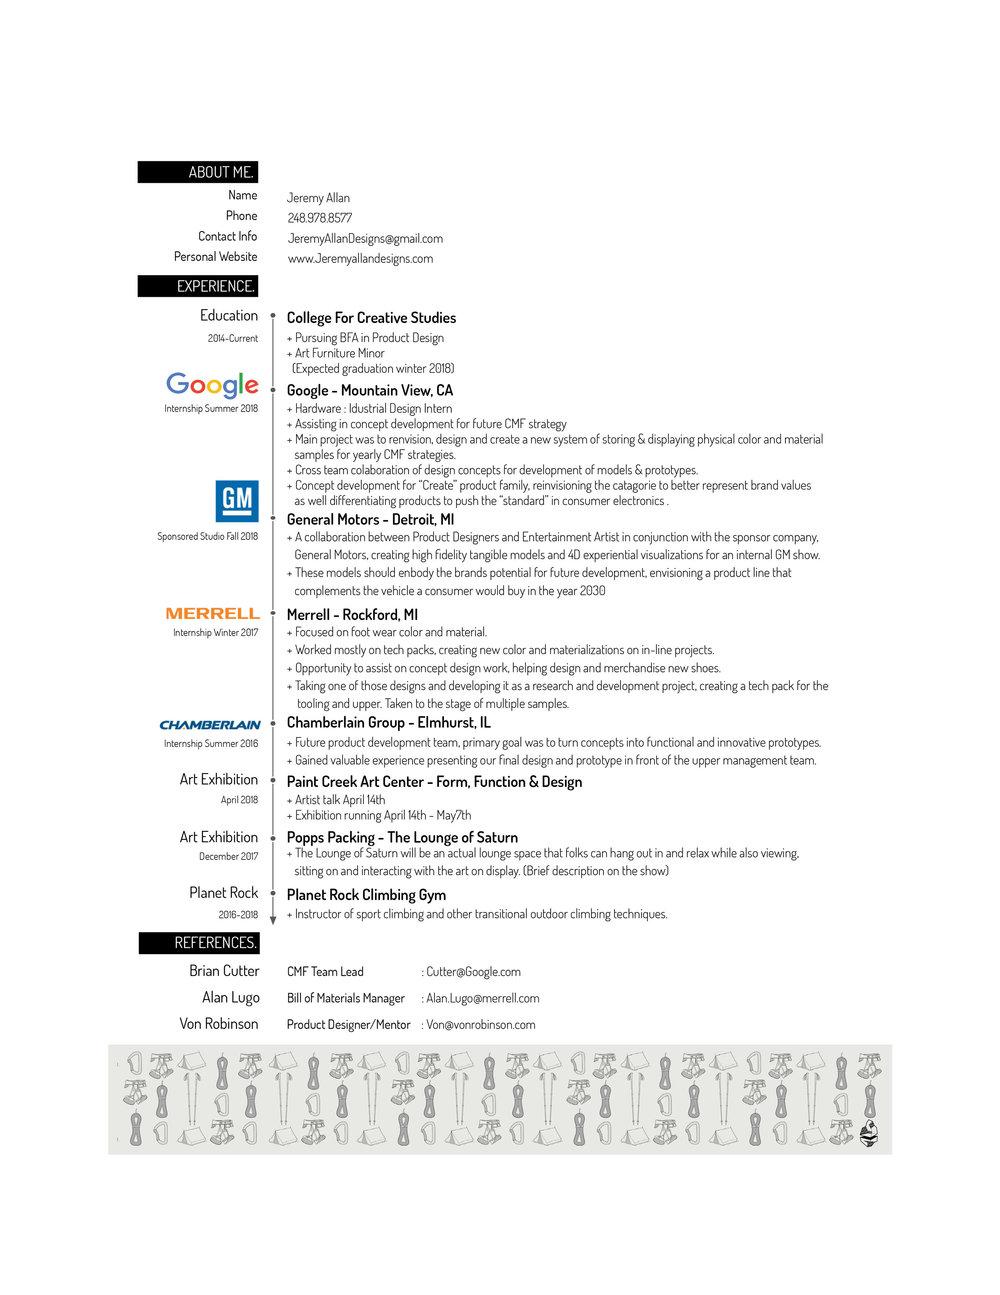 resume2018 copy.jpg